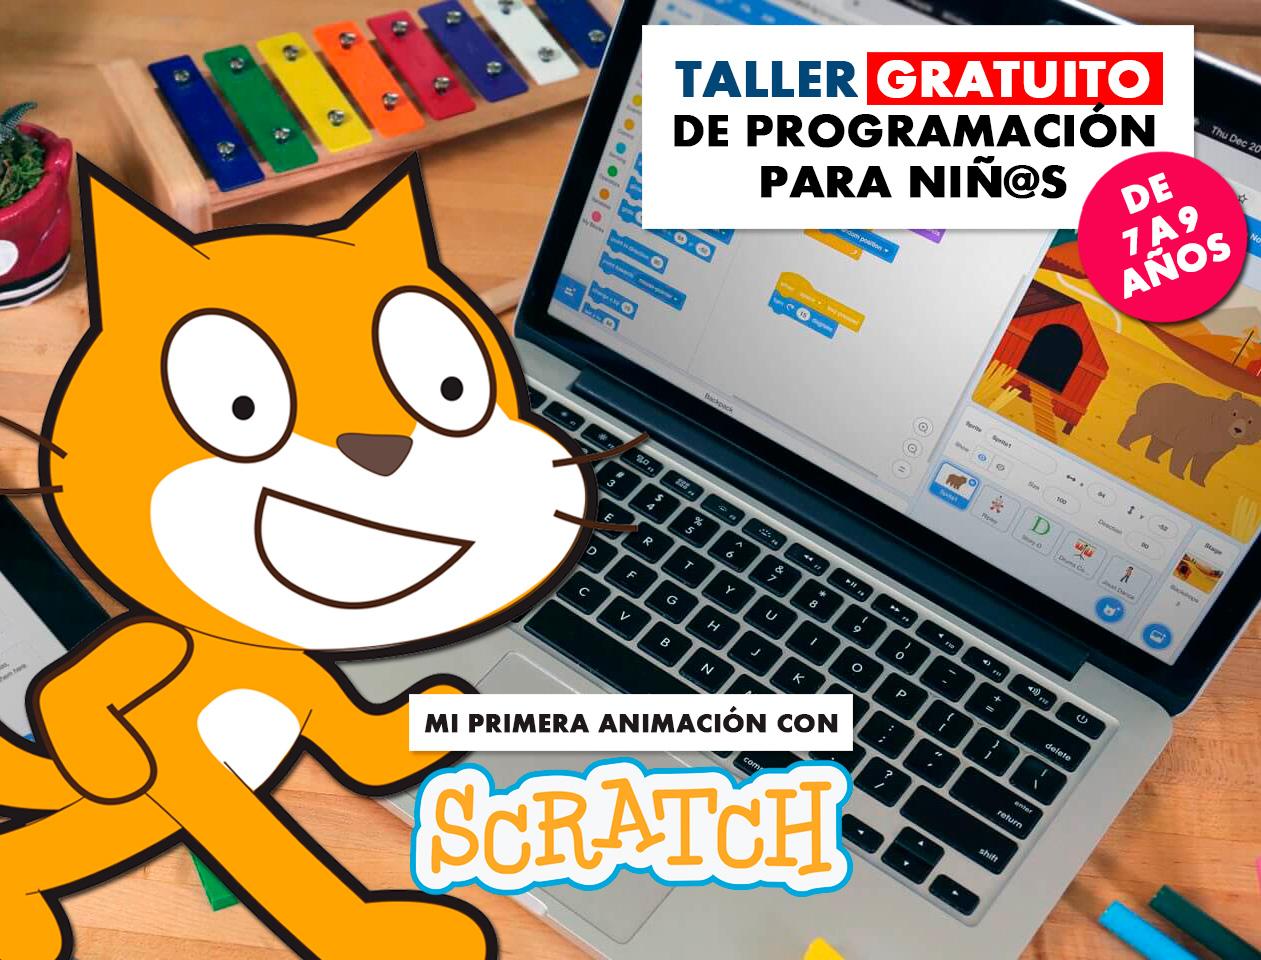 Taller Gratuito de programación de videojuegos con Scratch